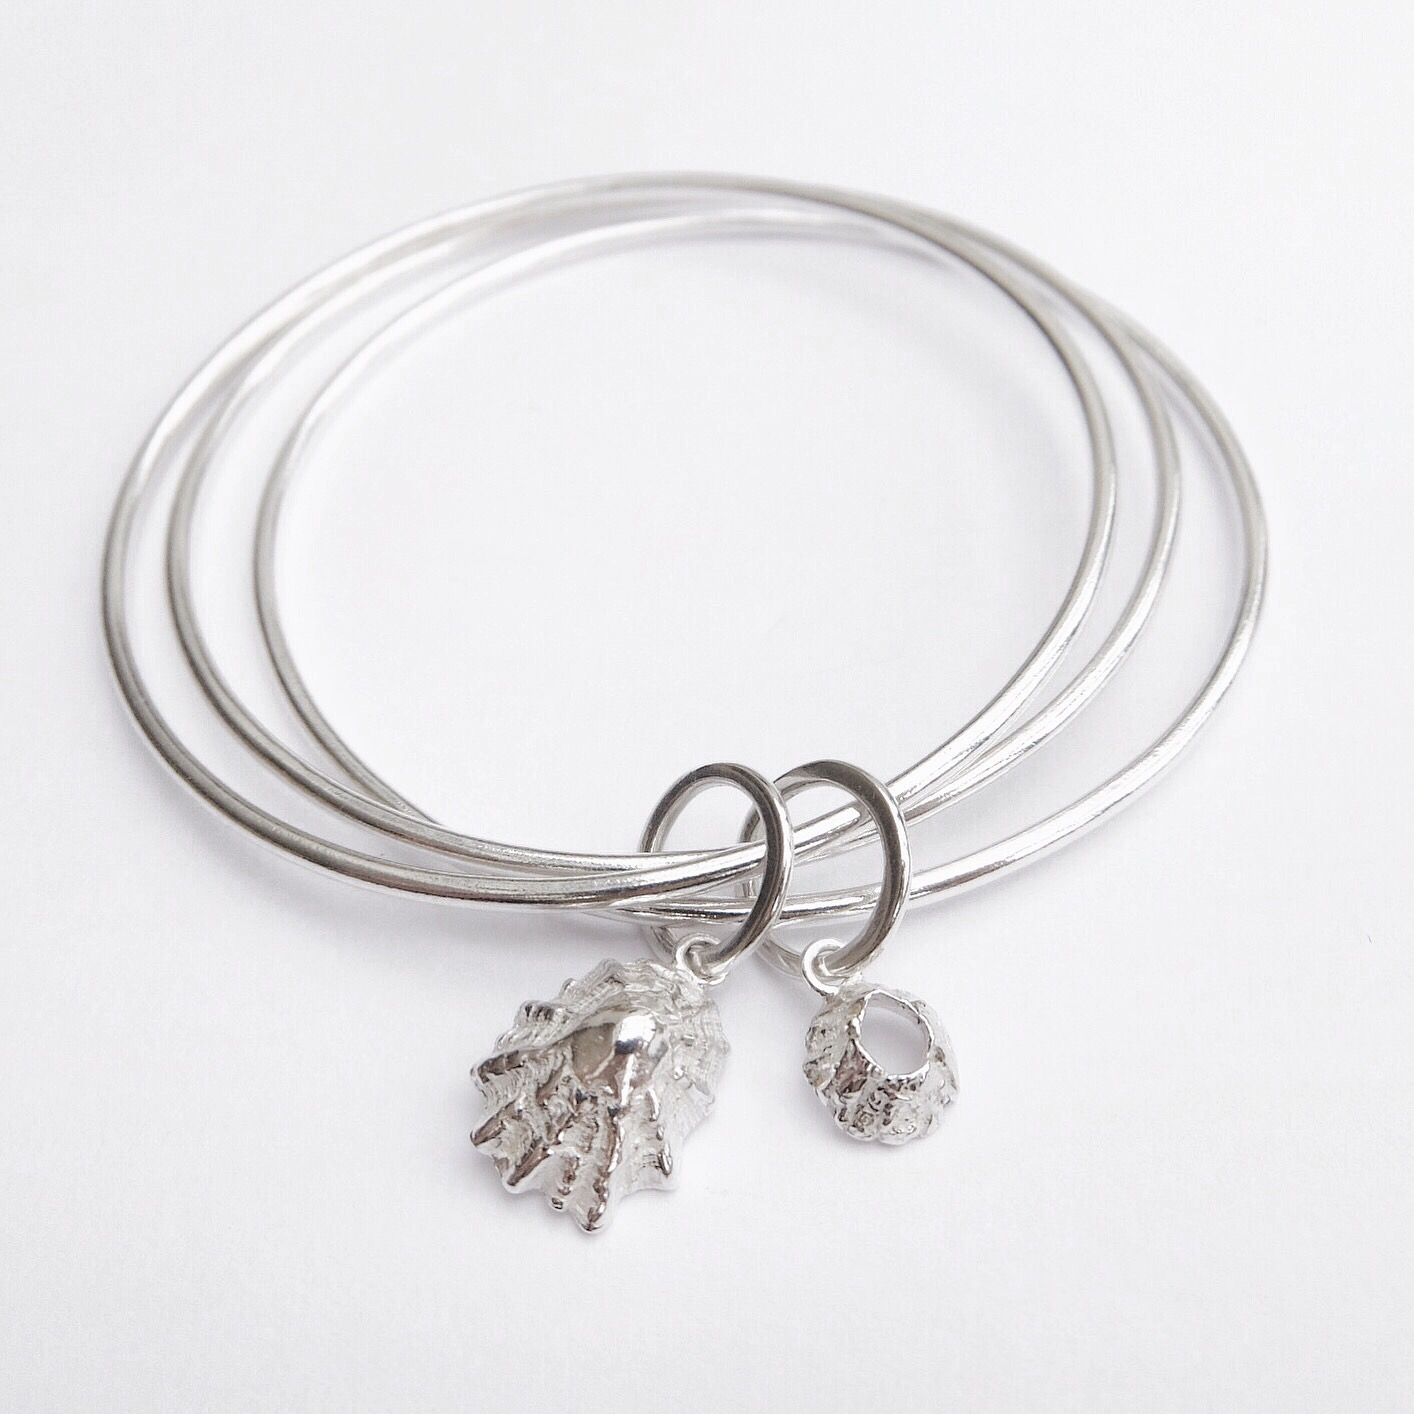 Barnacle and limpet sterling silver handmade bangle bracelet jasmine Bowden ocean inspired jewellery organic stacking bangles.jpg